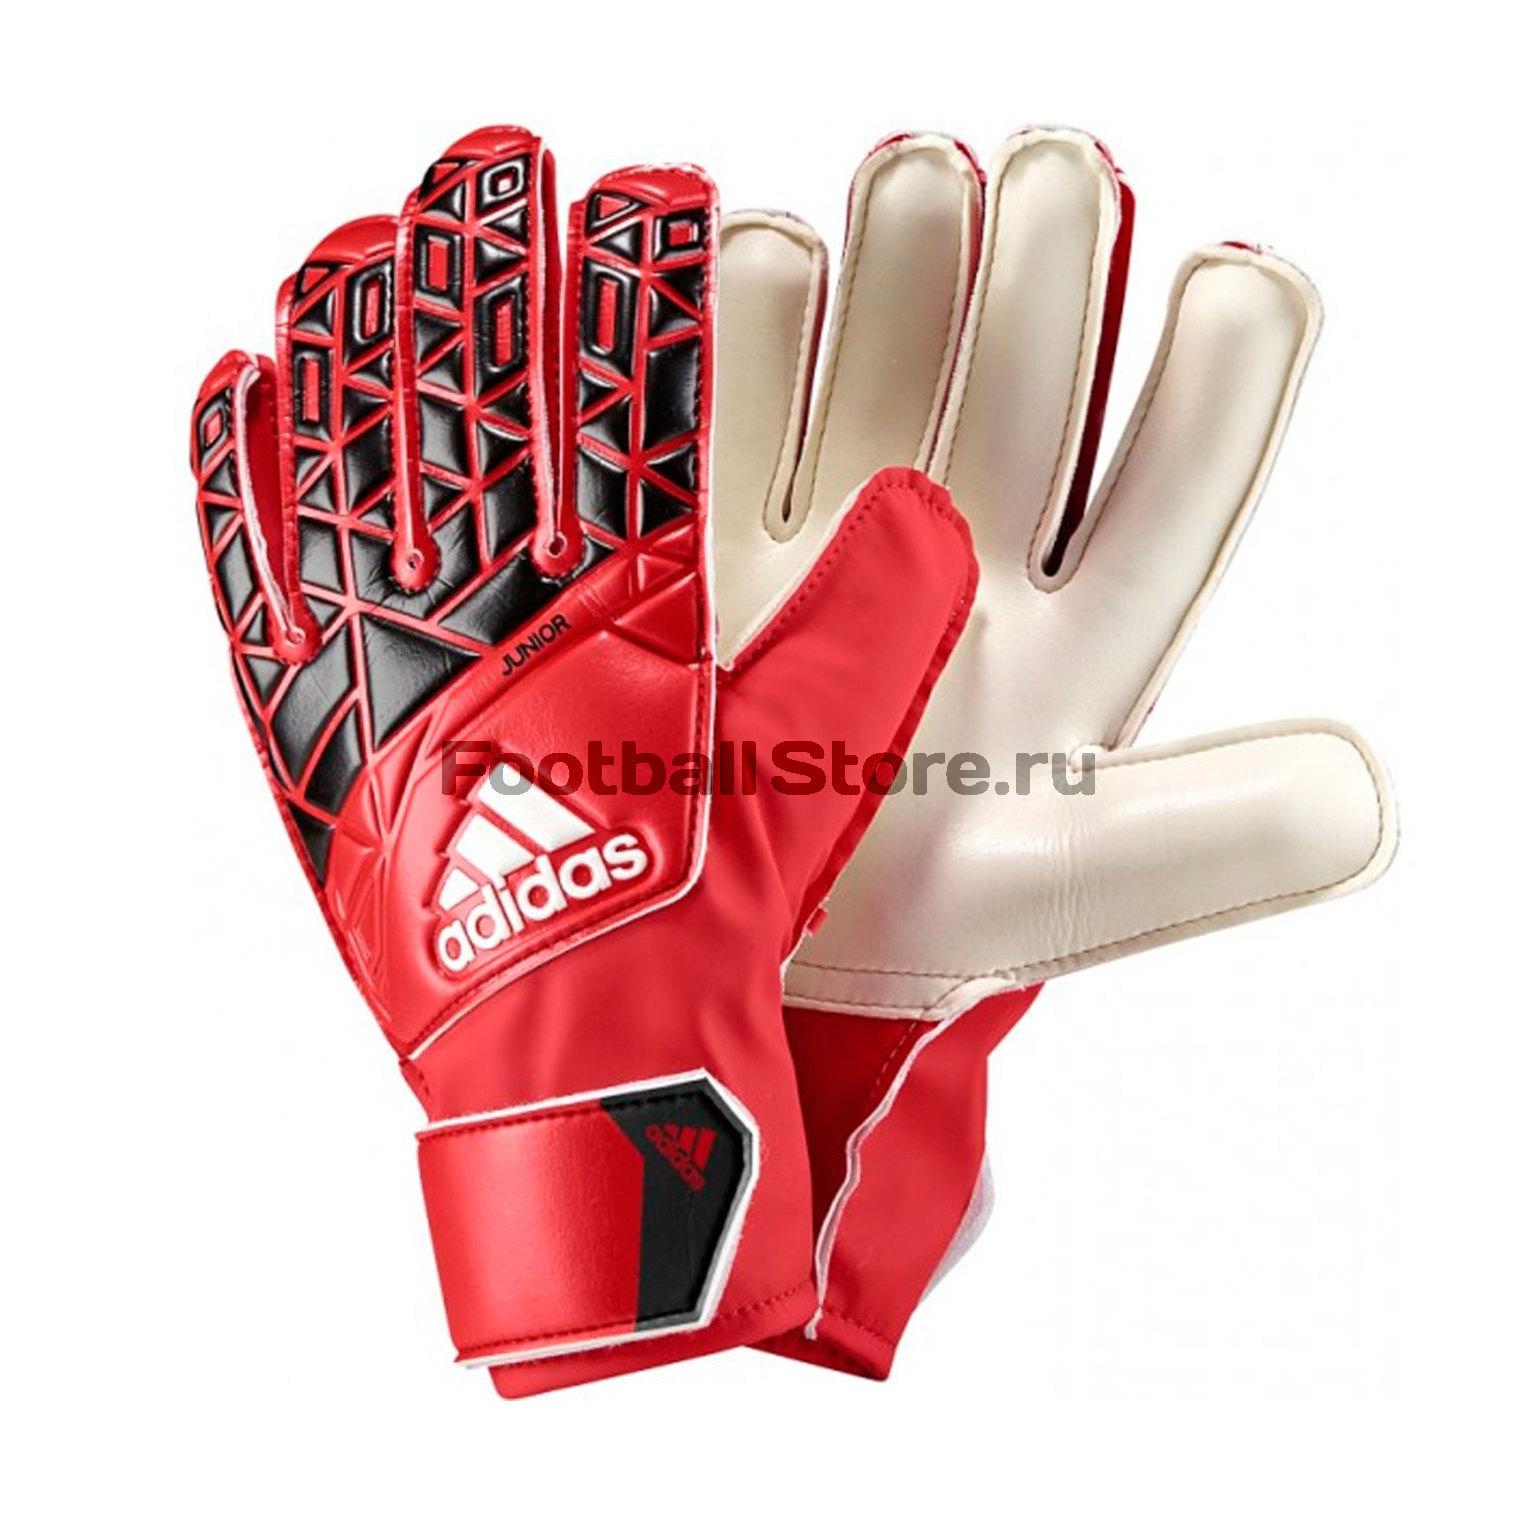 Перчатки вратарские Adidas Ace Junior AZ3678 перчатки adidas перчатки вратарские adidas ace magnetic st cd9131